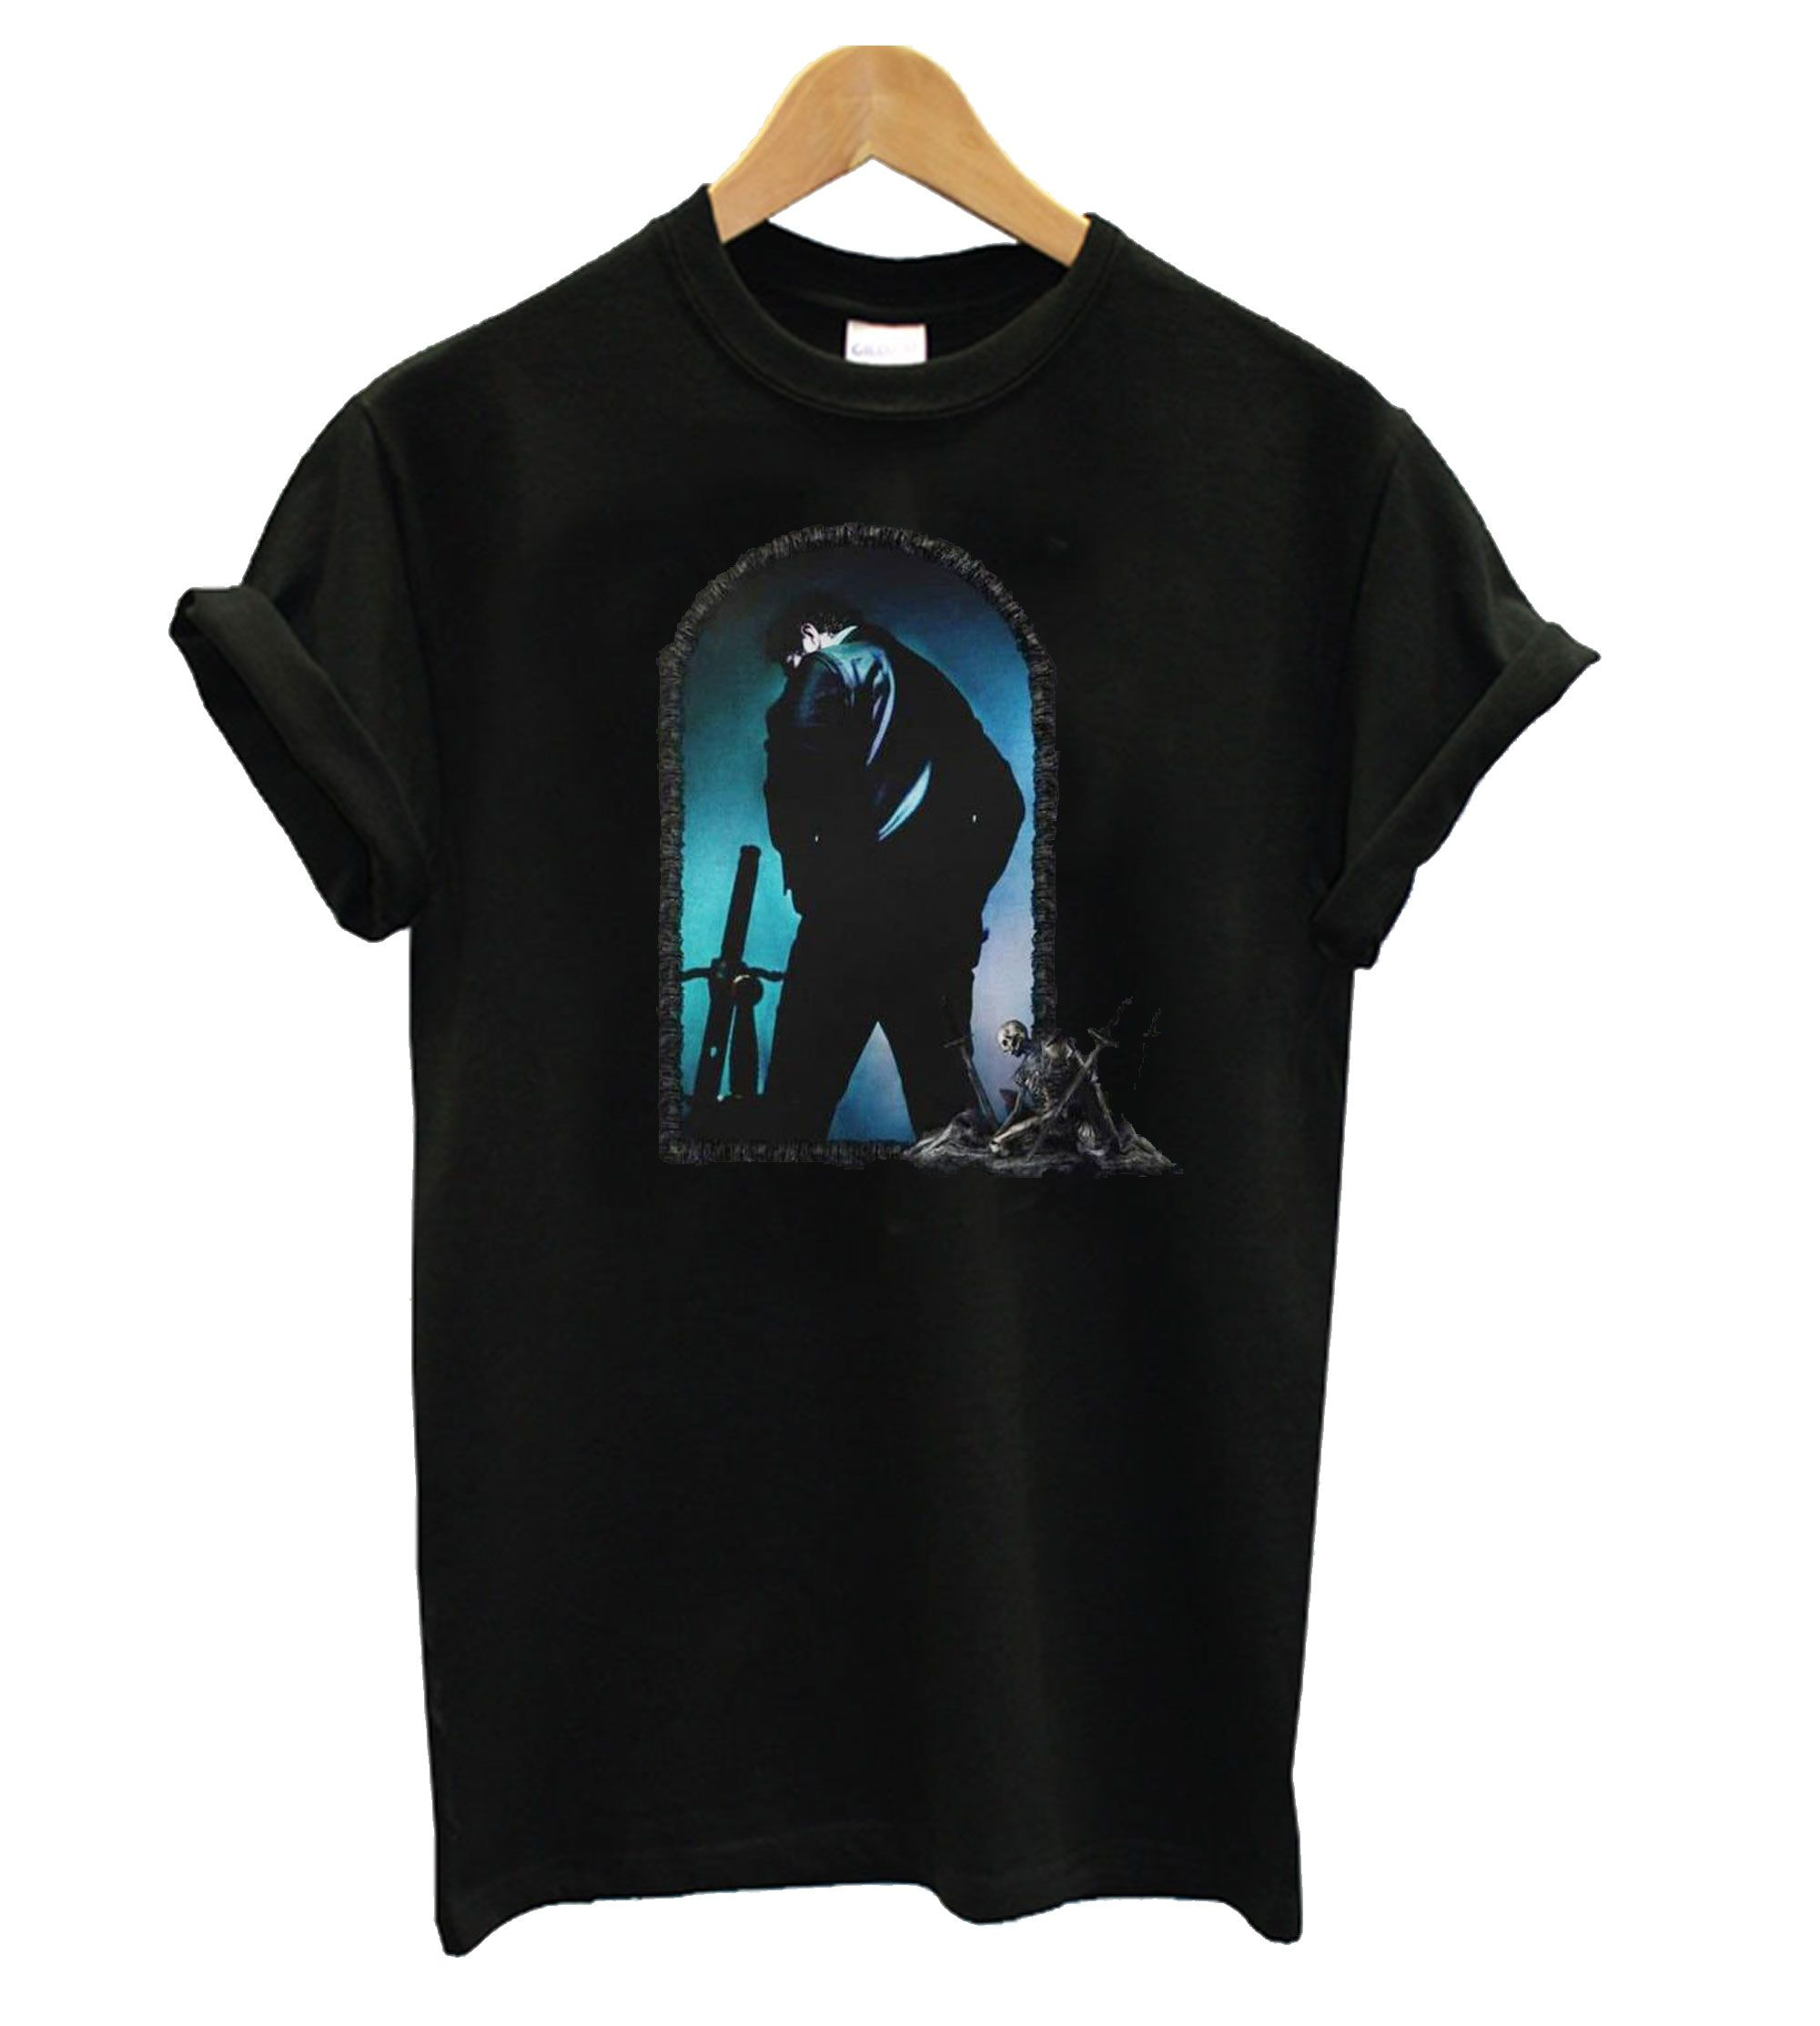 Post Malone's Hollywood's Bleeding T Shirt